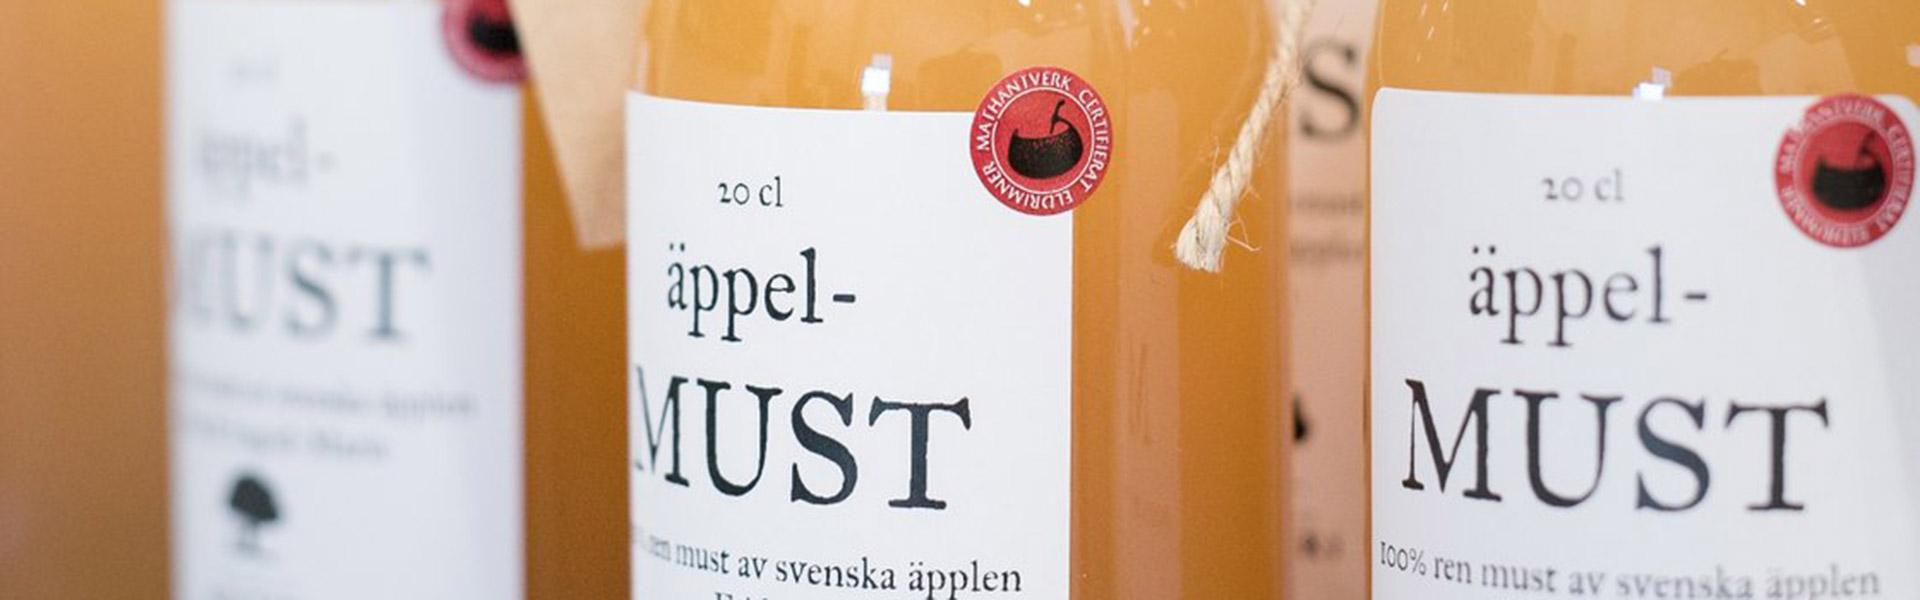 Norrtelje Musteri - Flaskor med must